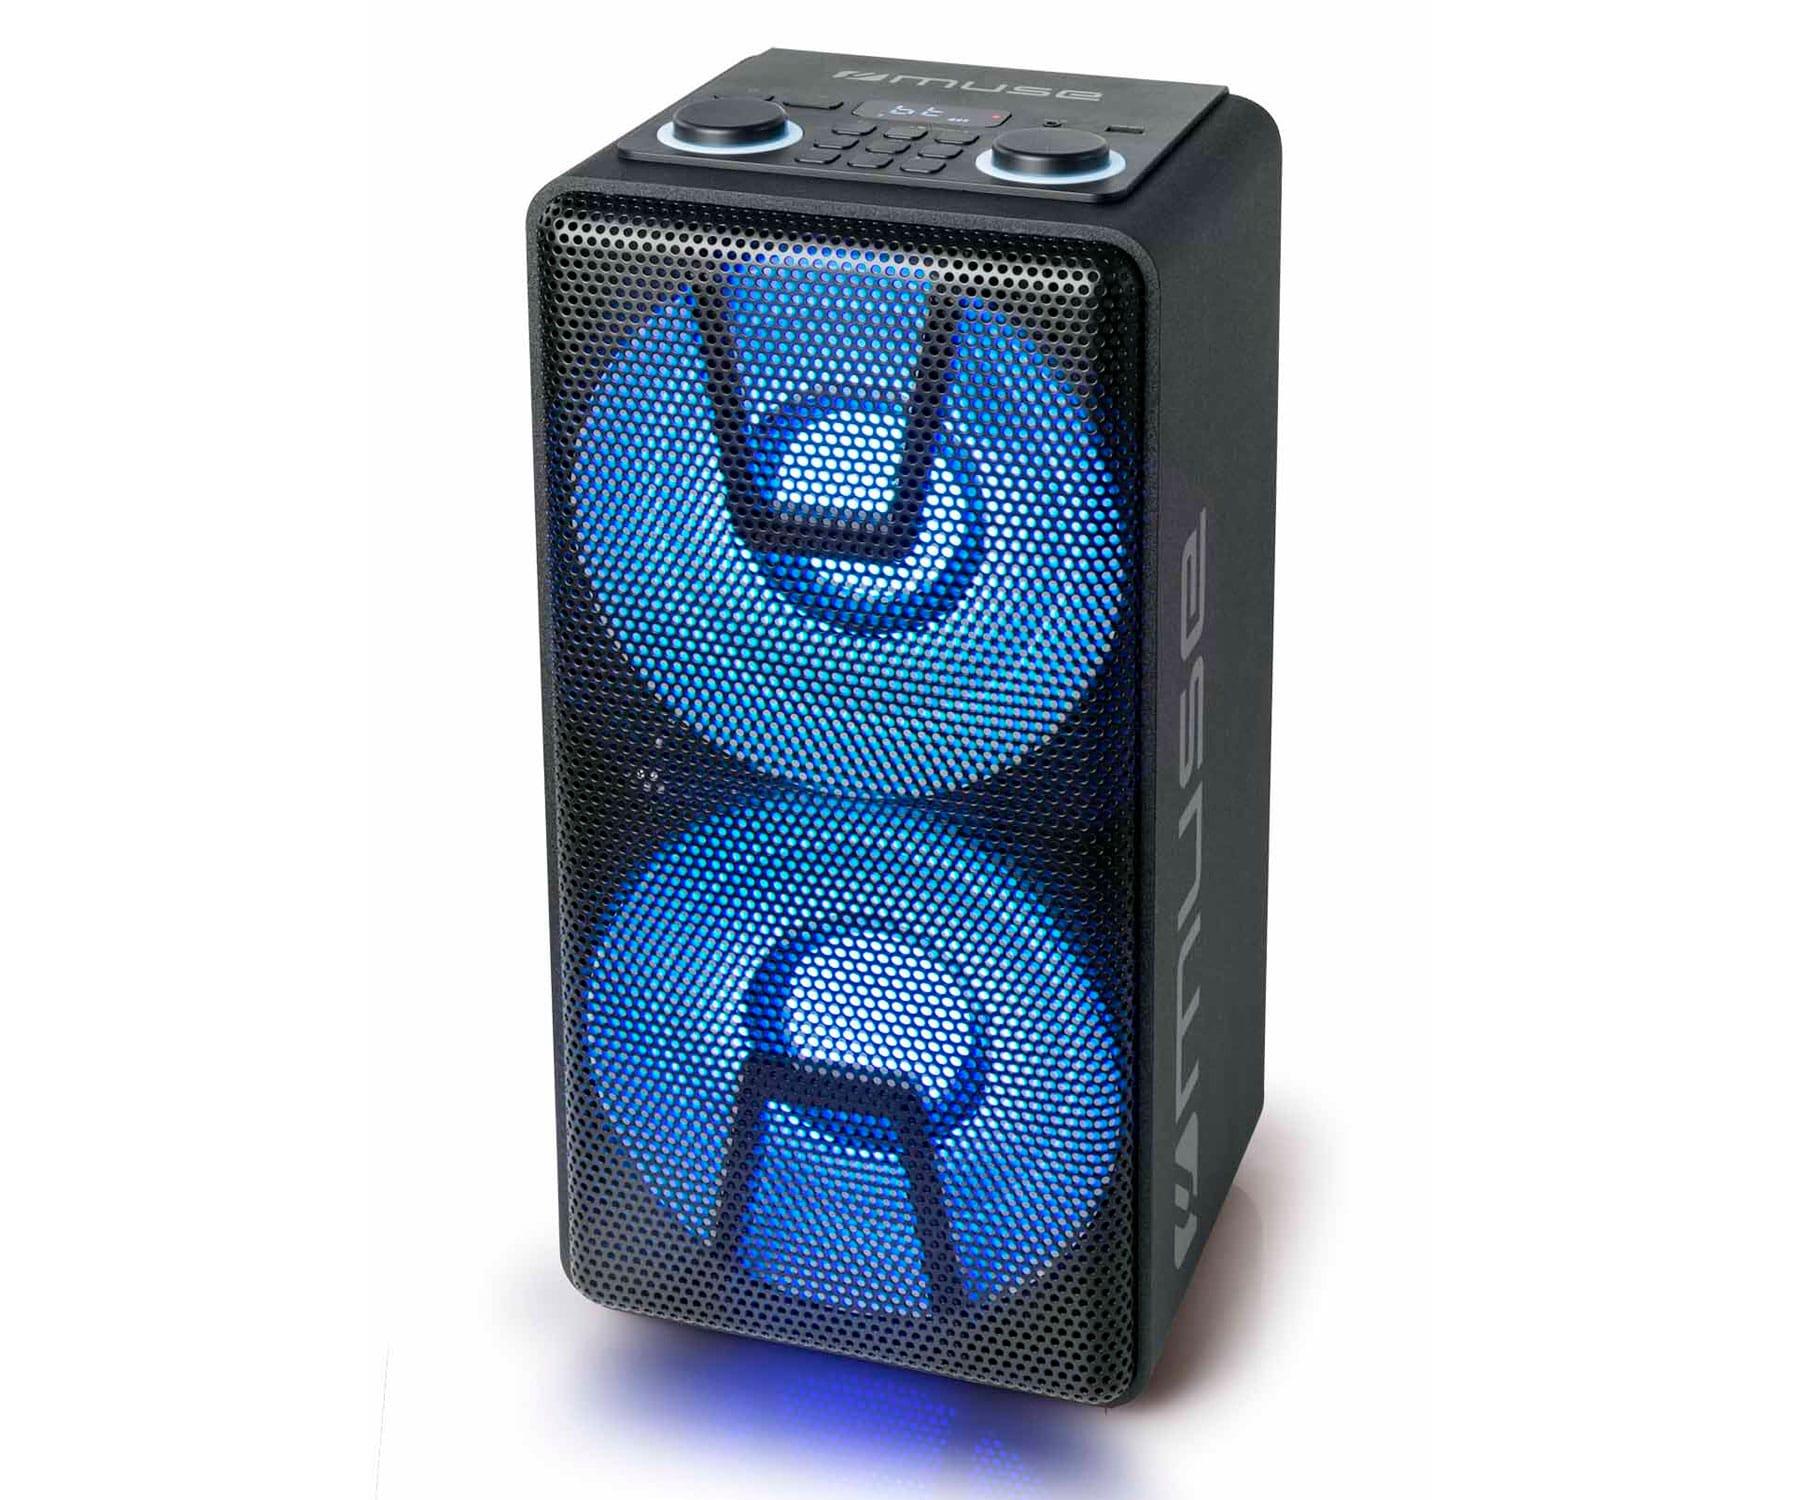 MUSE M1805DJ PARTY BOX BT 150W/ Bluetooth/ FM / USB reproductor/ Entrada micro y guitarra